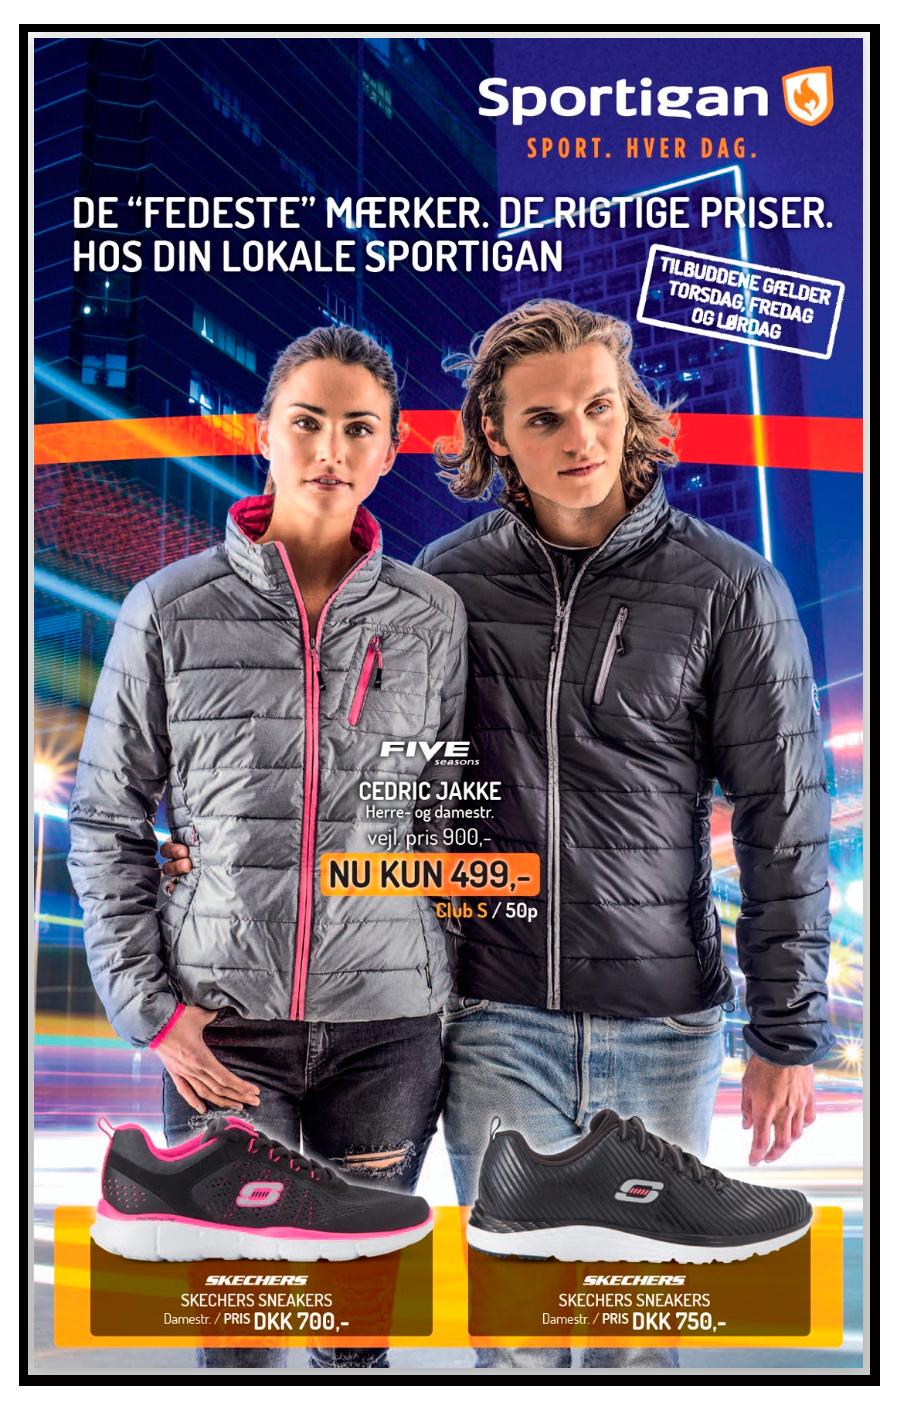 Sportigan katalog uge 36